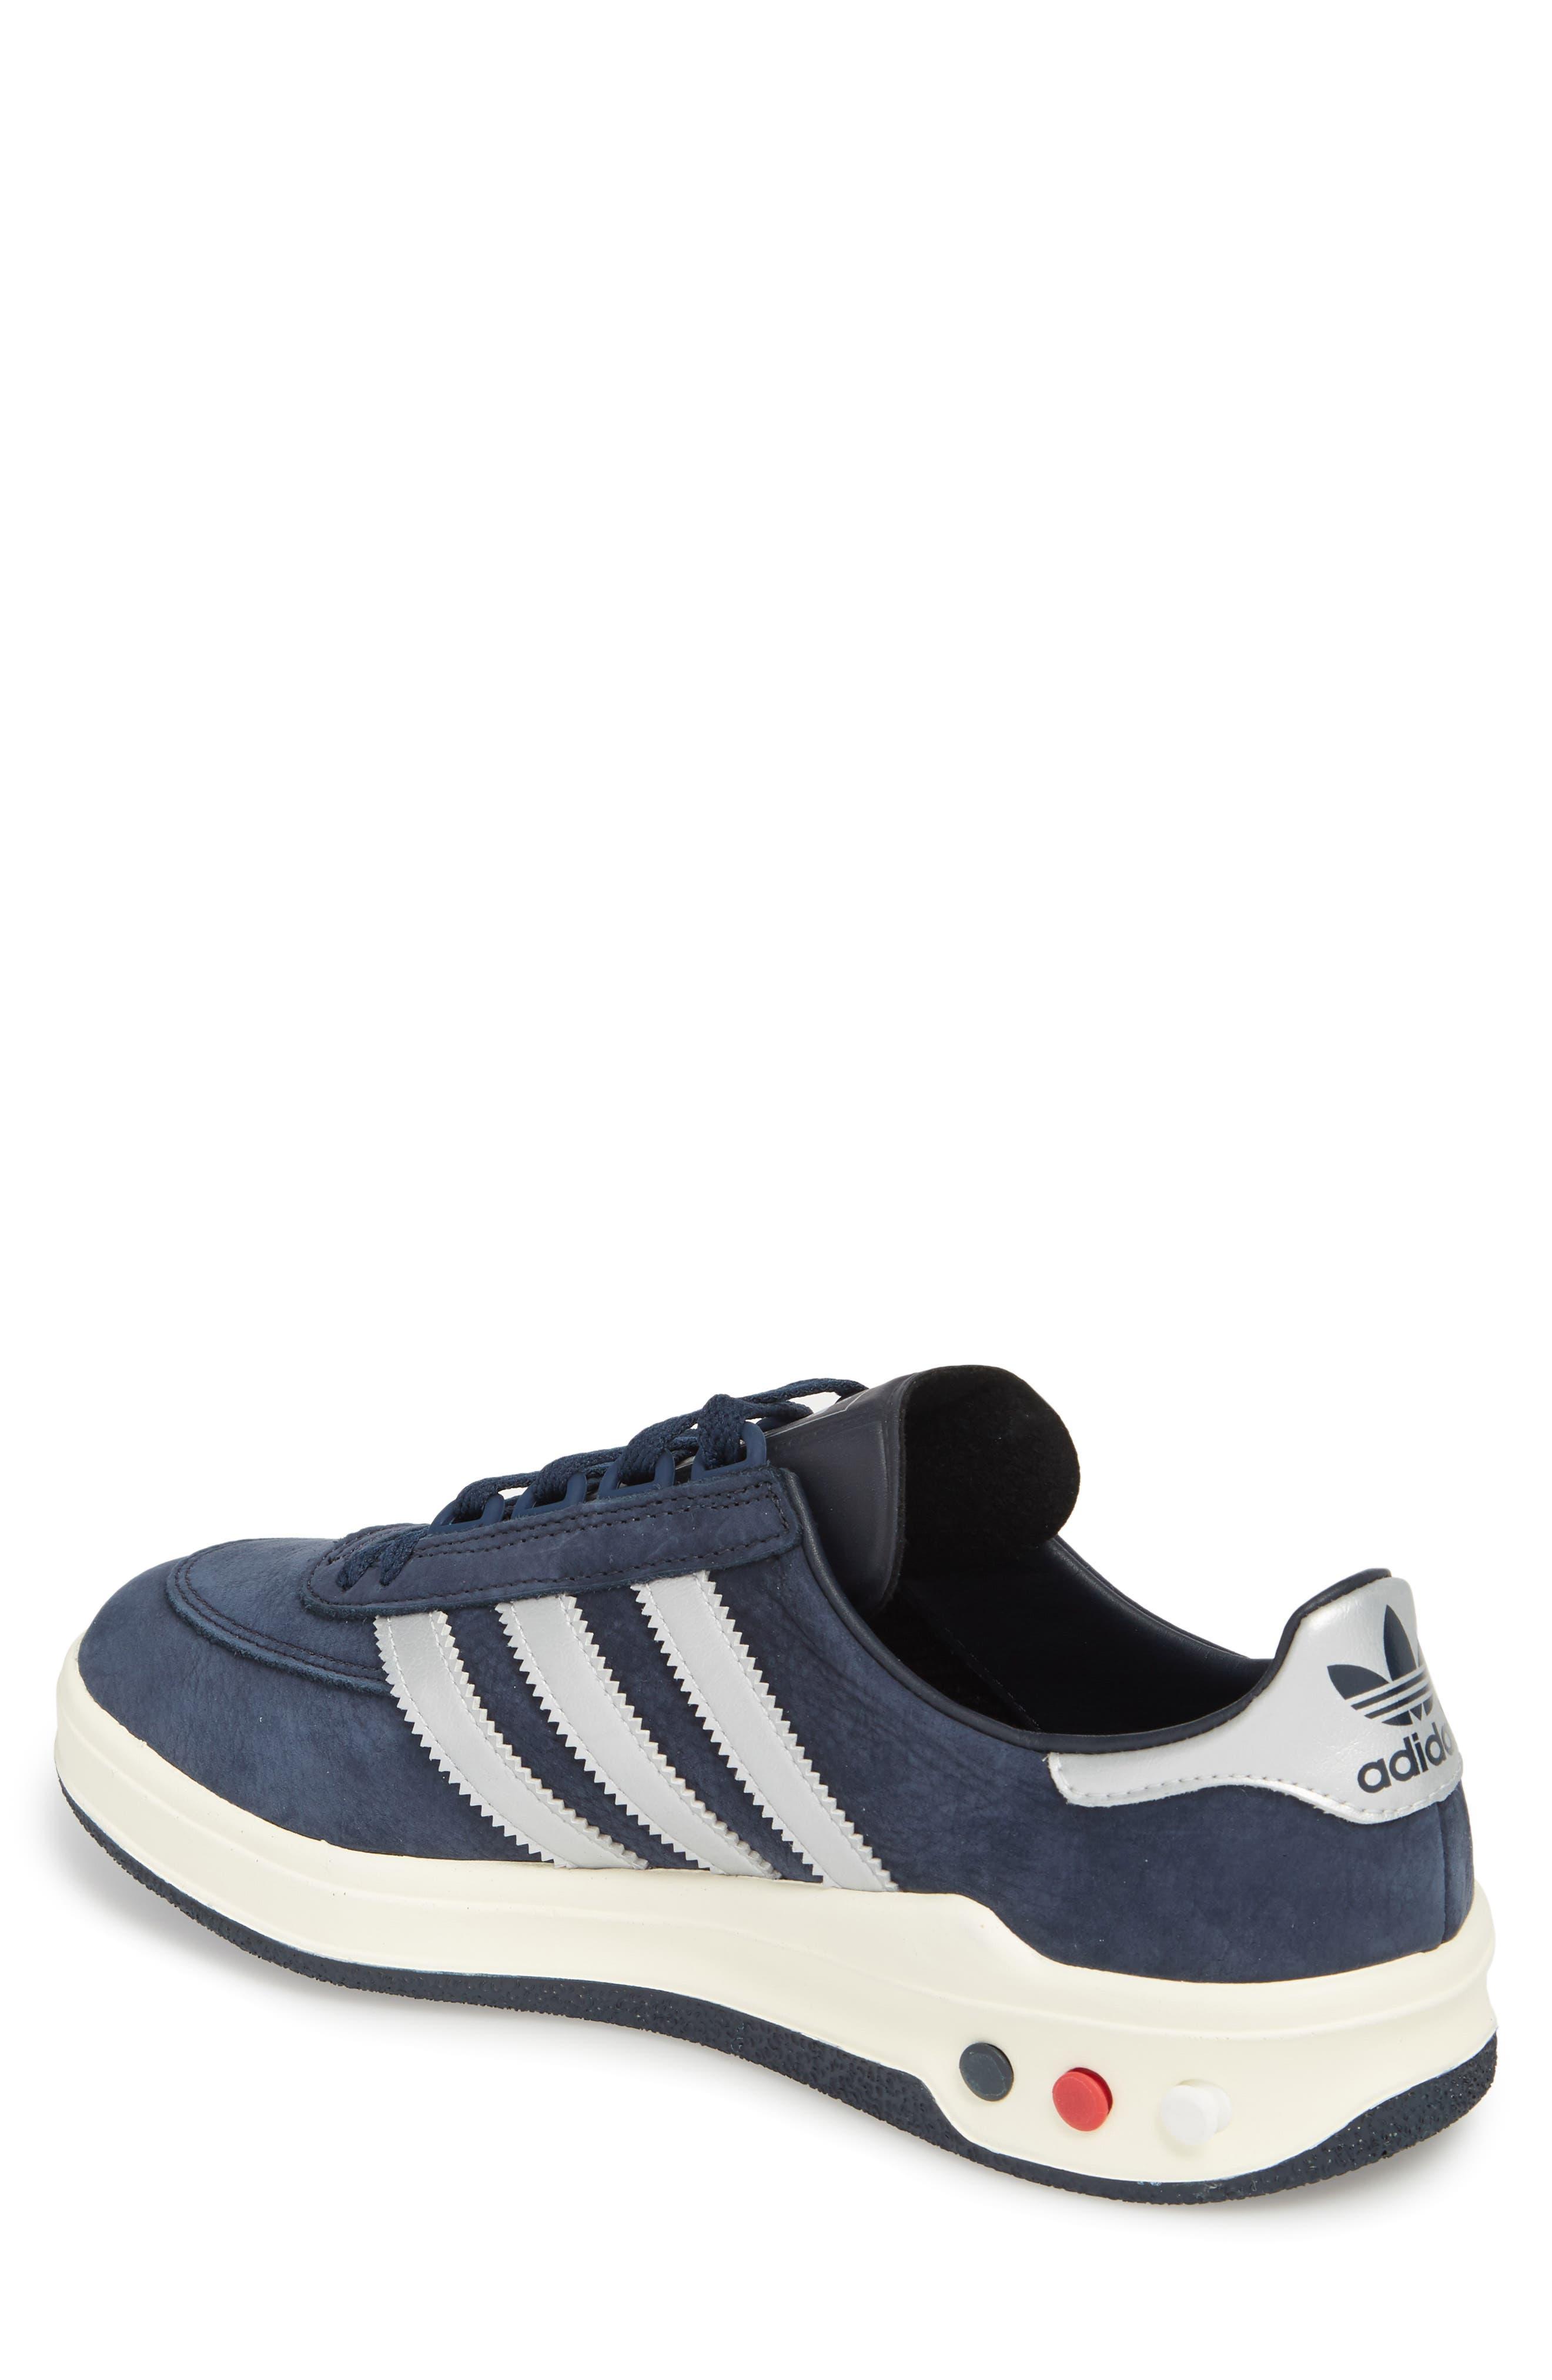 CLMBA SPZL Sneaker,                             Alternate thumbnail 2, color,                             Night Navy/ Silver/ White